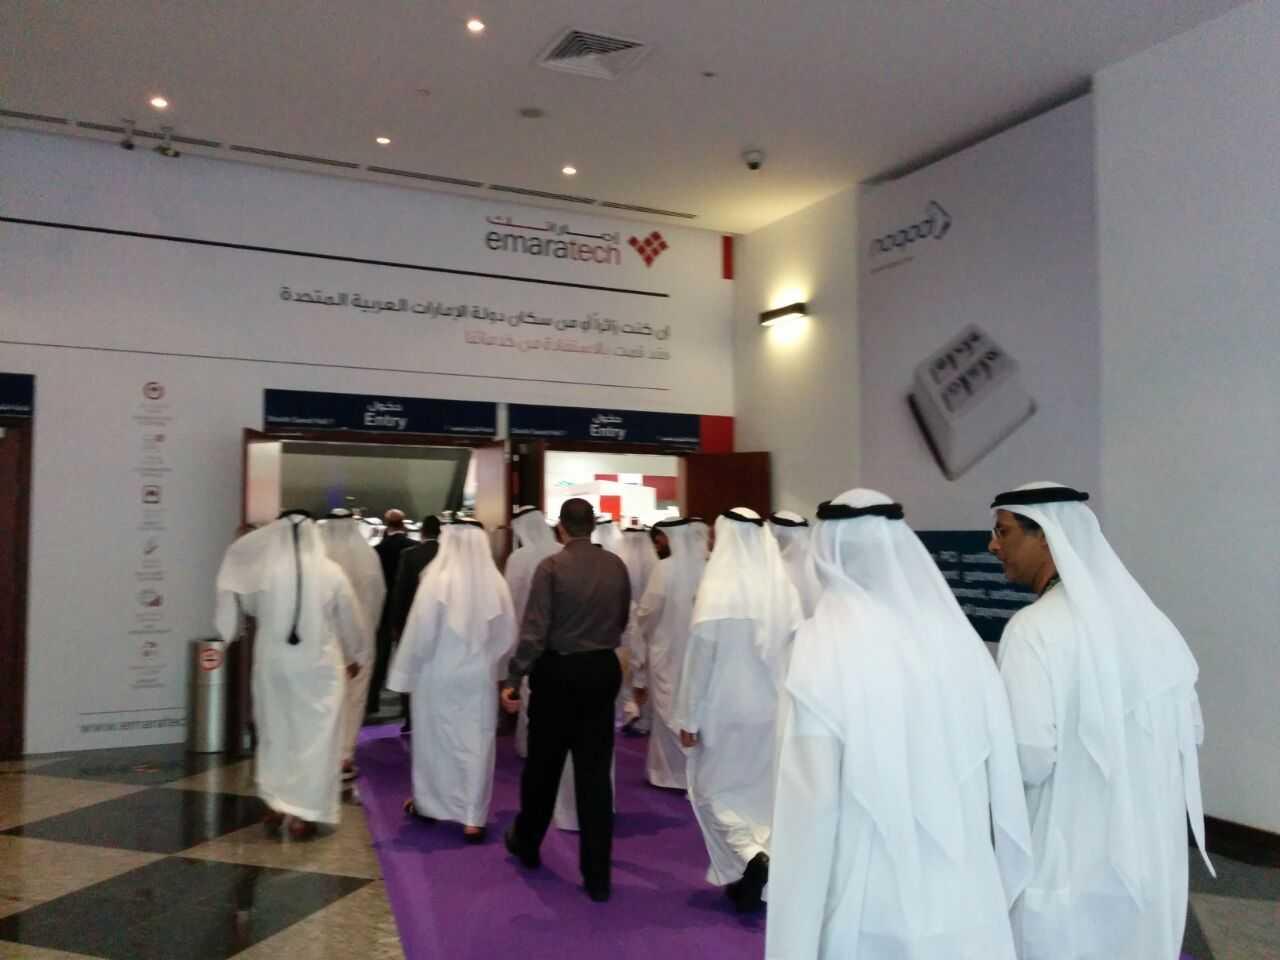 UAE Nationals at Gitex 2014